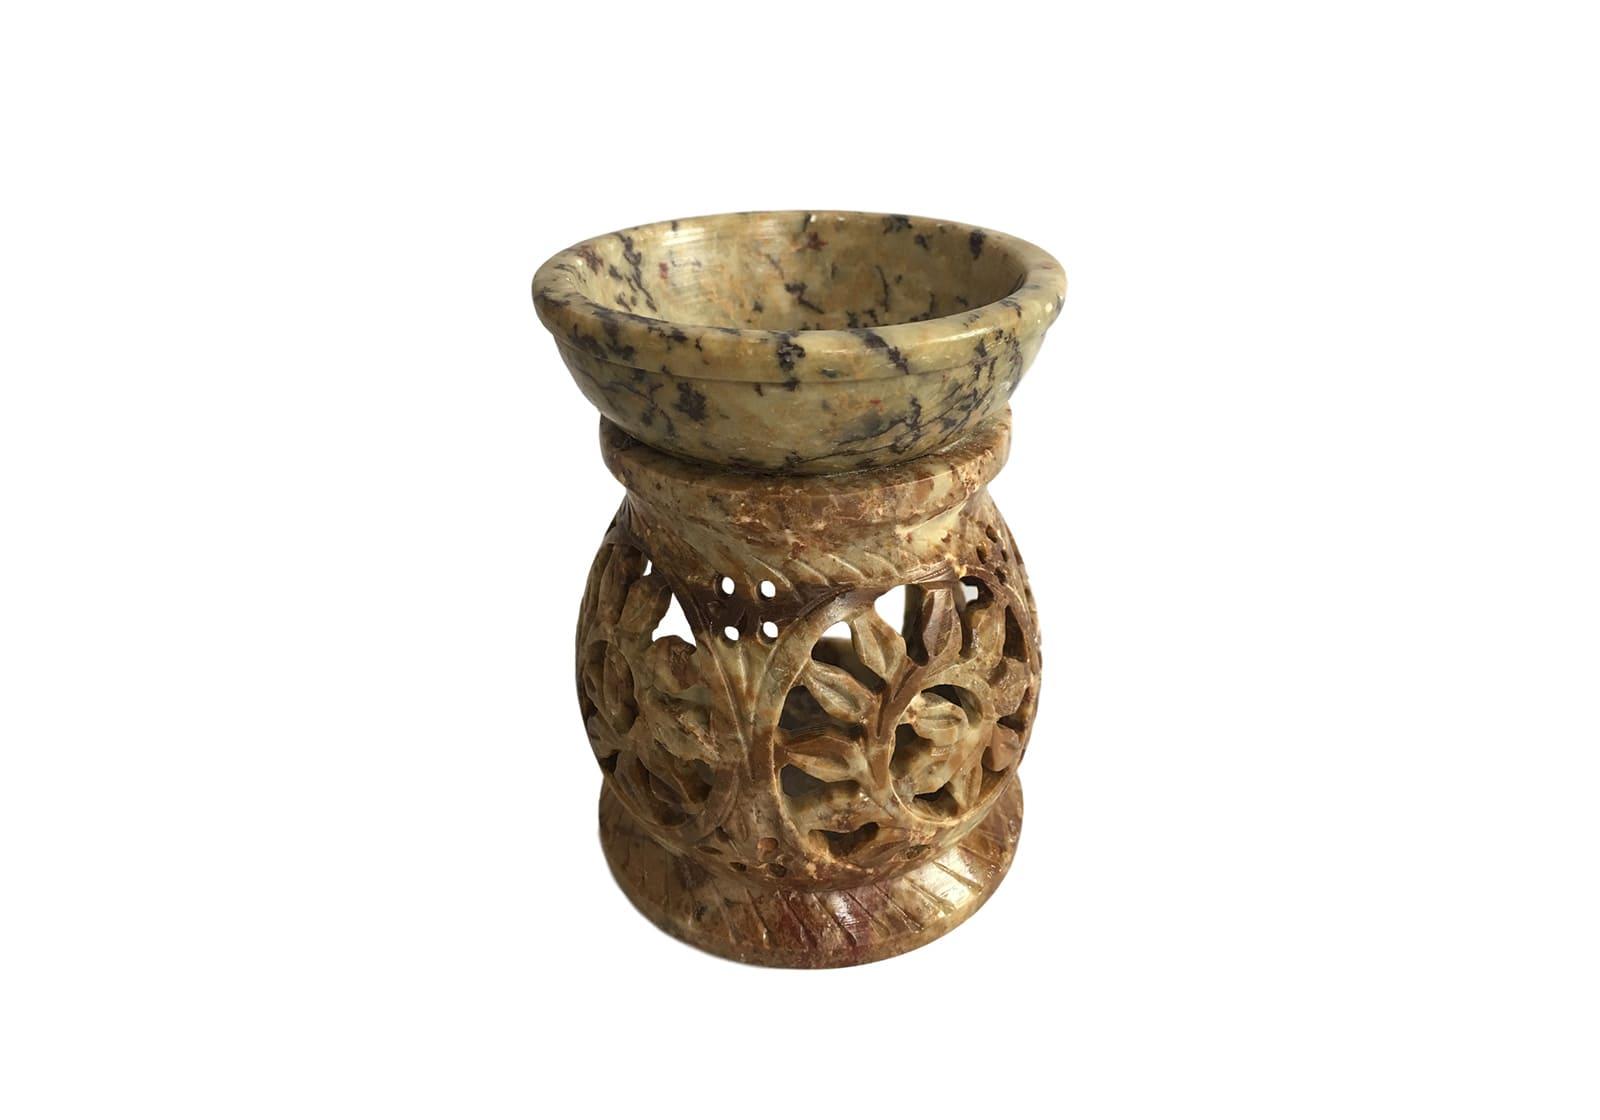 Фото Аромалампа каменная круглая со спиралями 9,5*7,5*7 см Индия (арт.518)